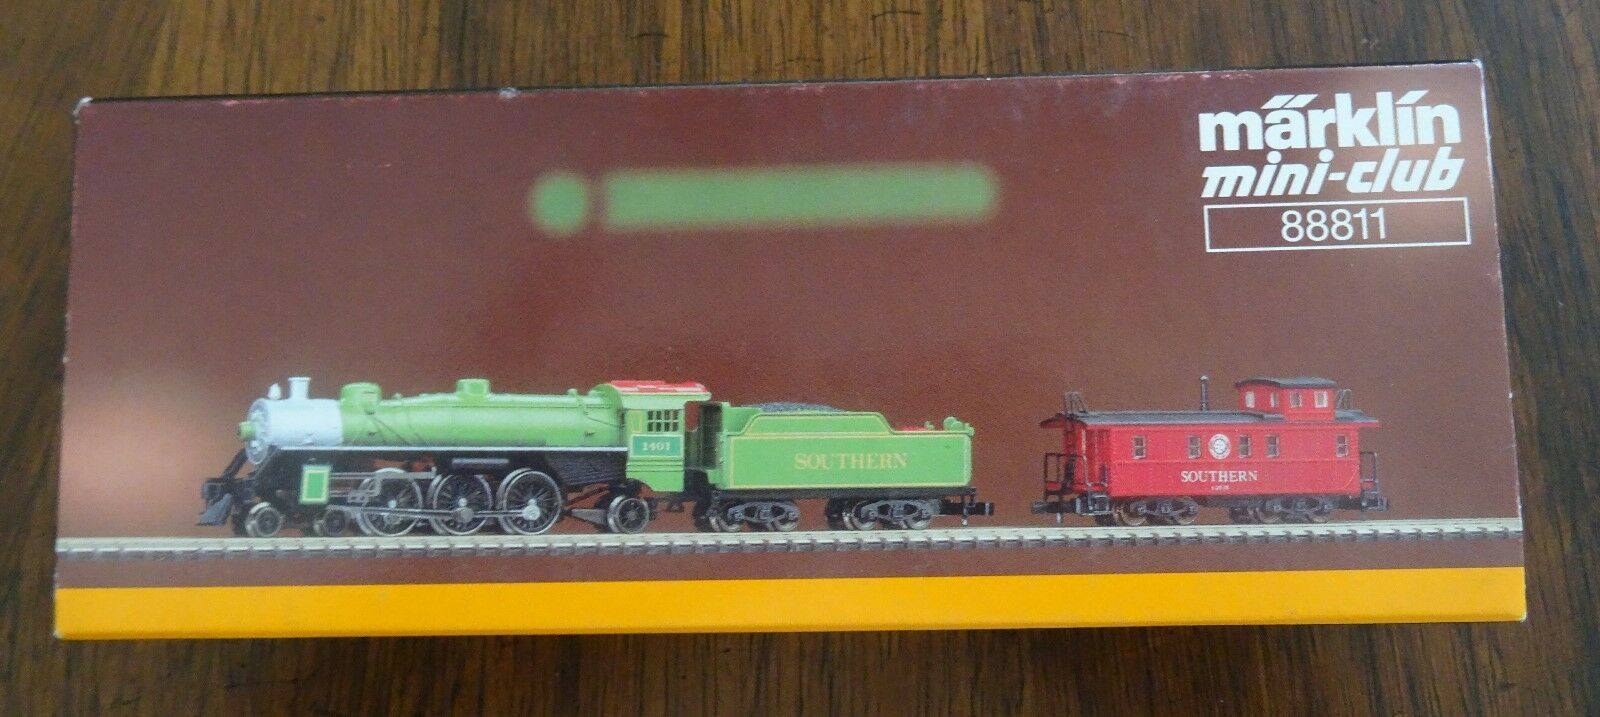 Brand New Marklin Southern Pacific Railway Mini Z Scale Locomotive